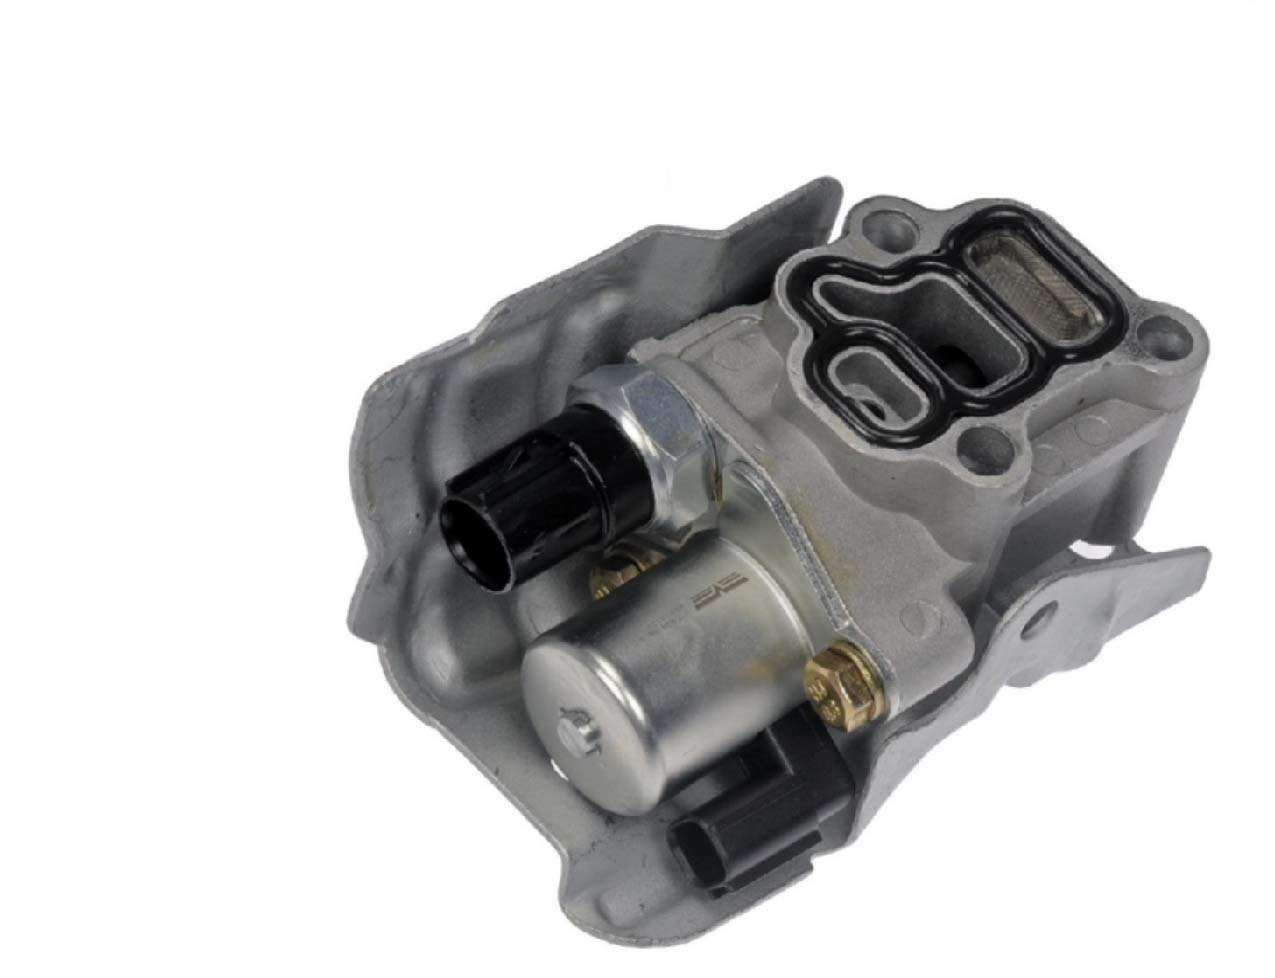 PP19030 VTEC Solenoid Spool Valve w/Oil Pressure Sensor & Filter Compatible to OEM 15810-RAA-A03